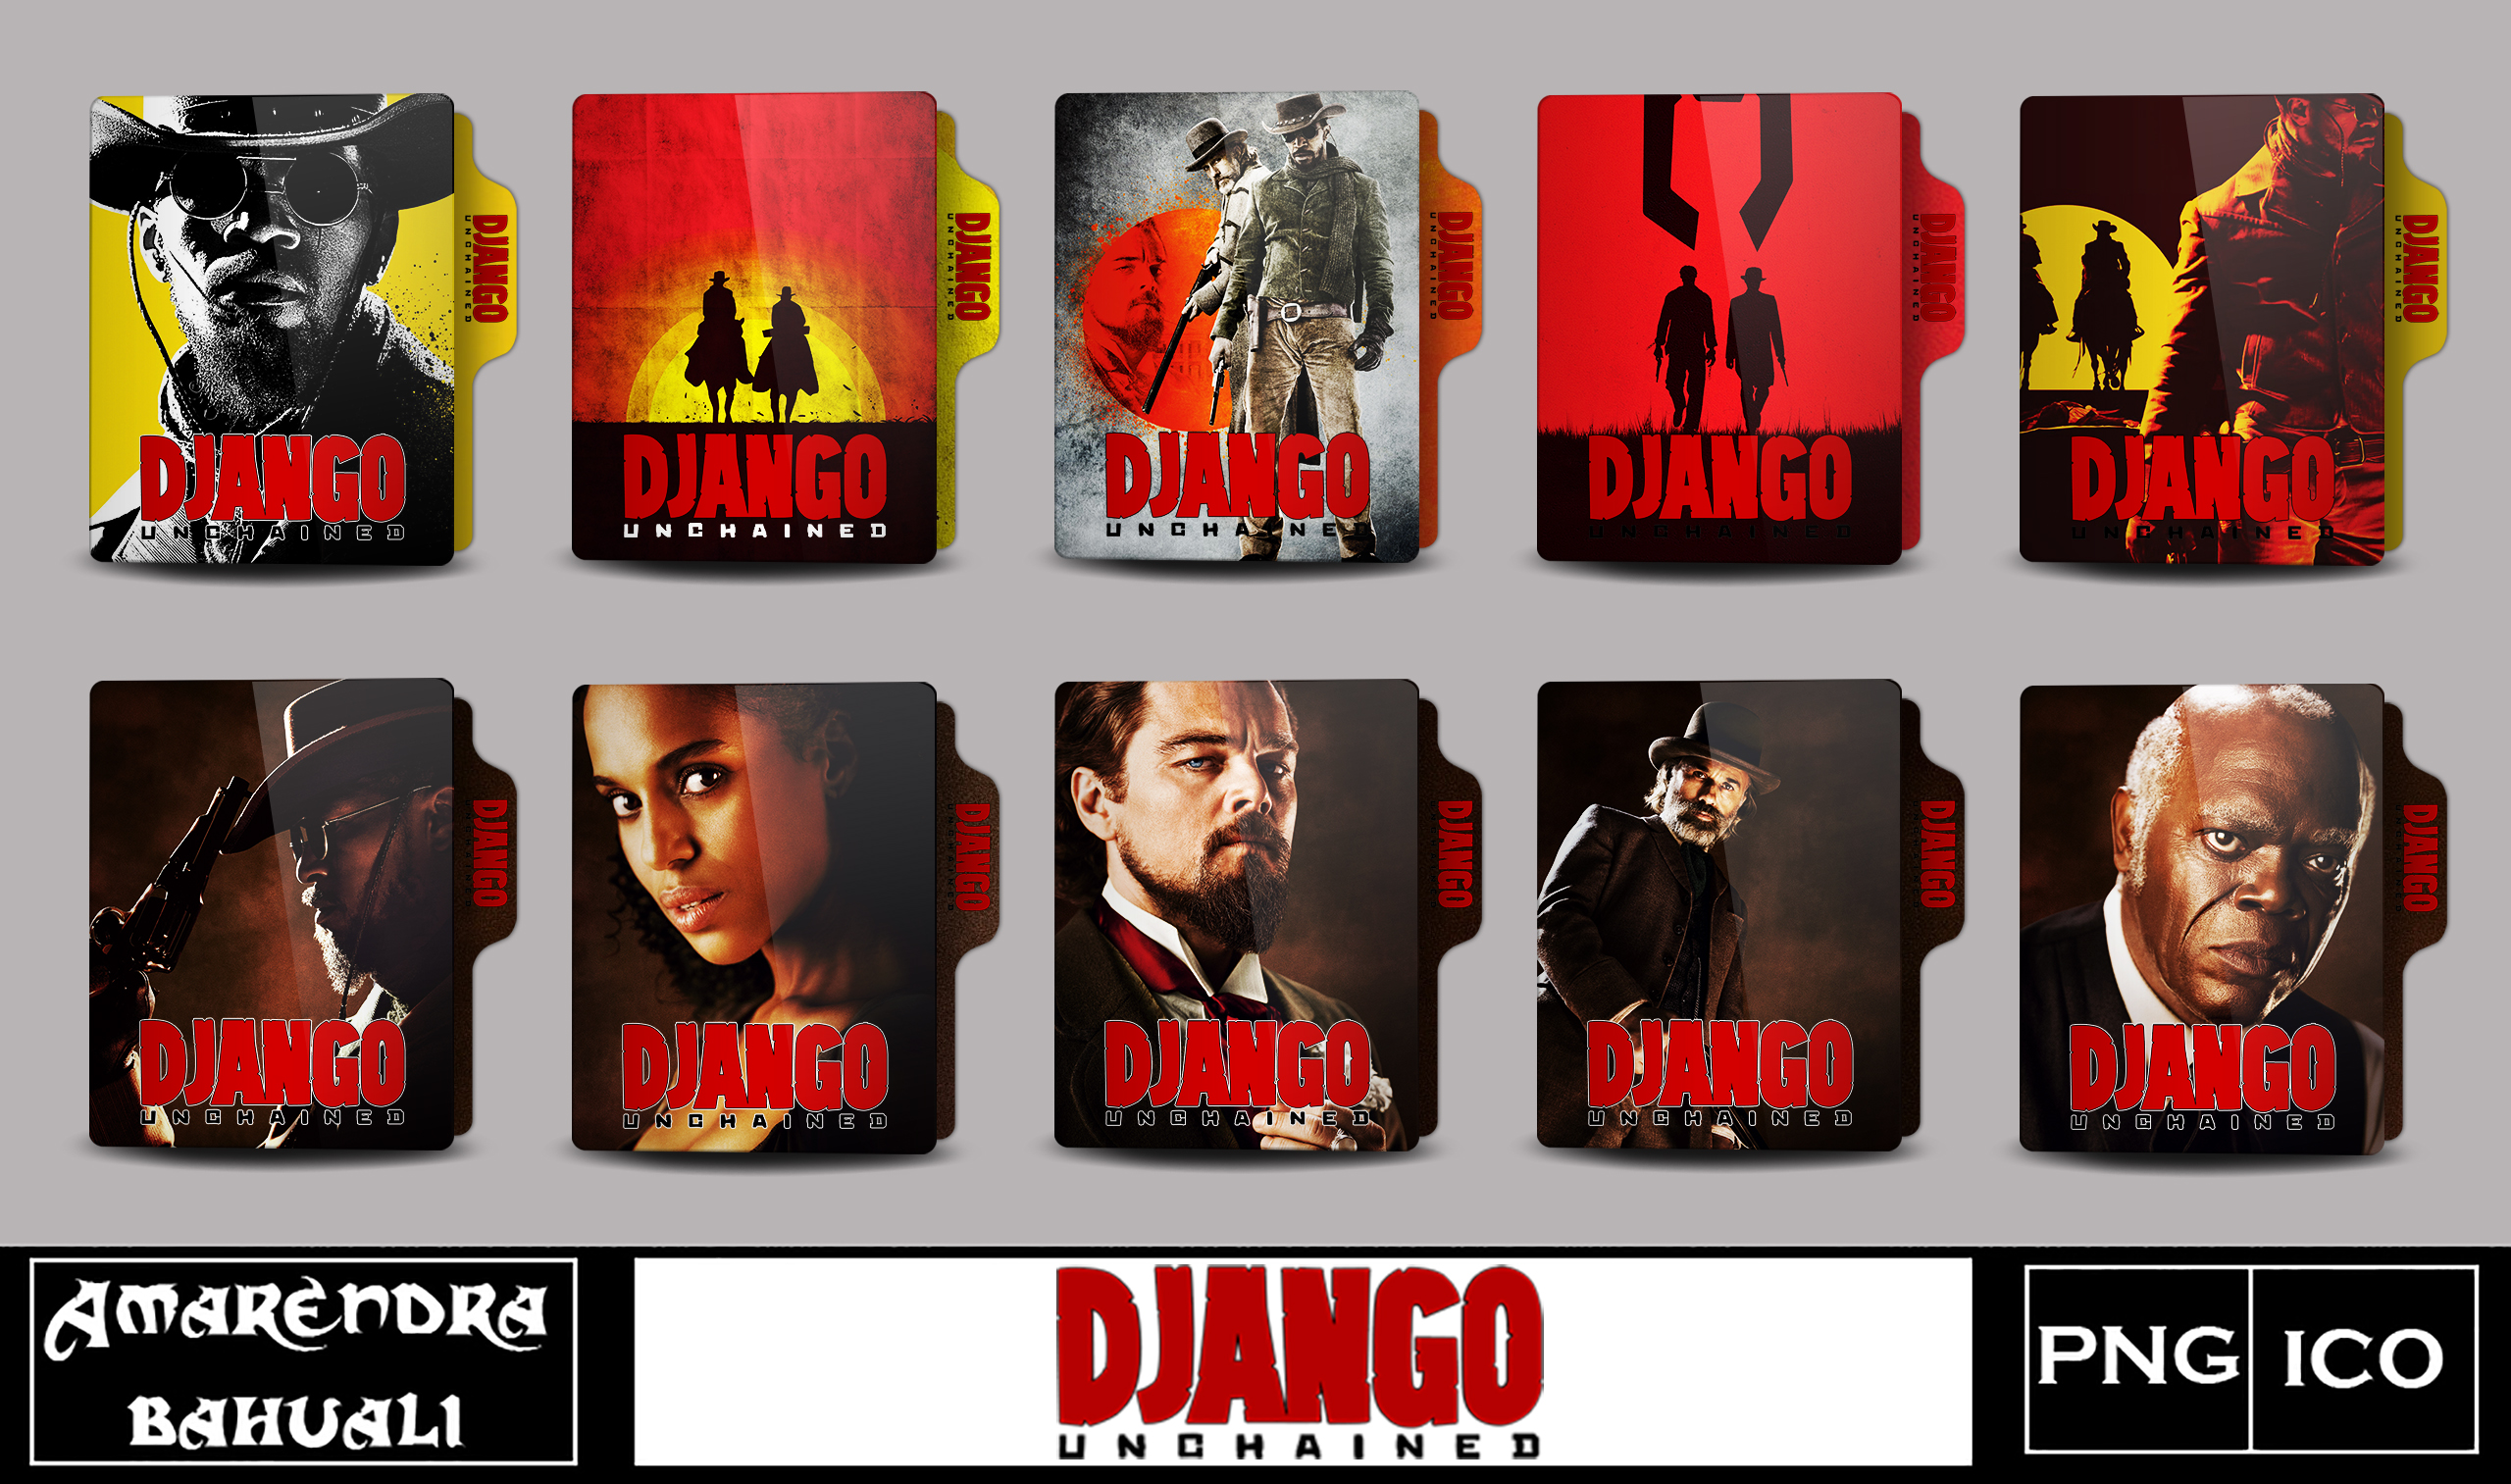 Django Unchained 2012 Folder Icon By G0d 0f Thund3r On Deviantart